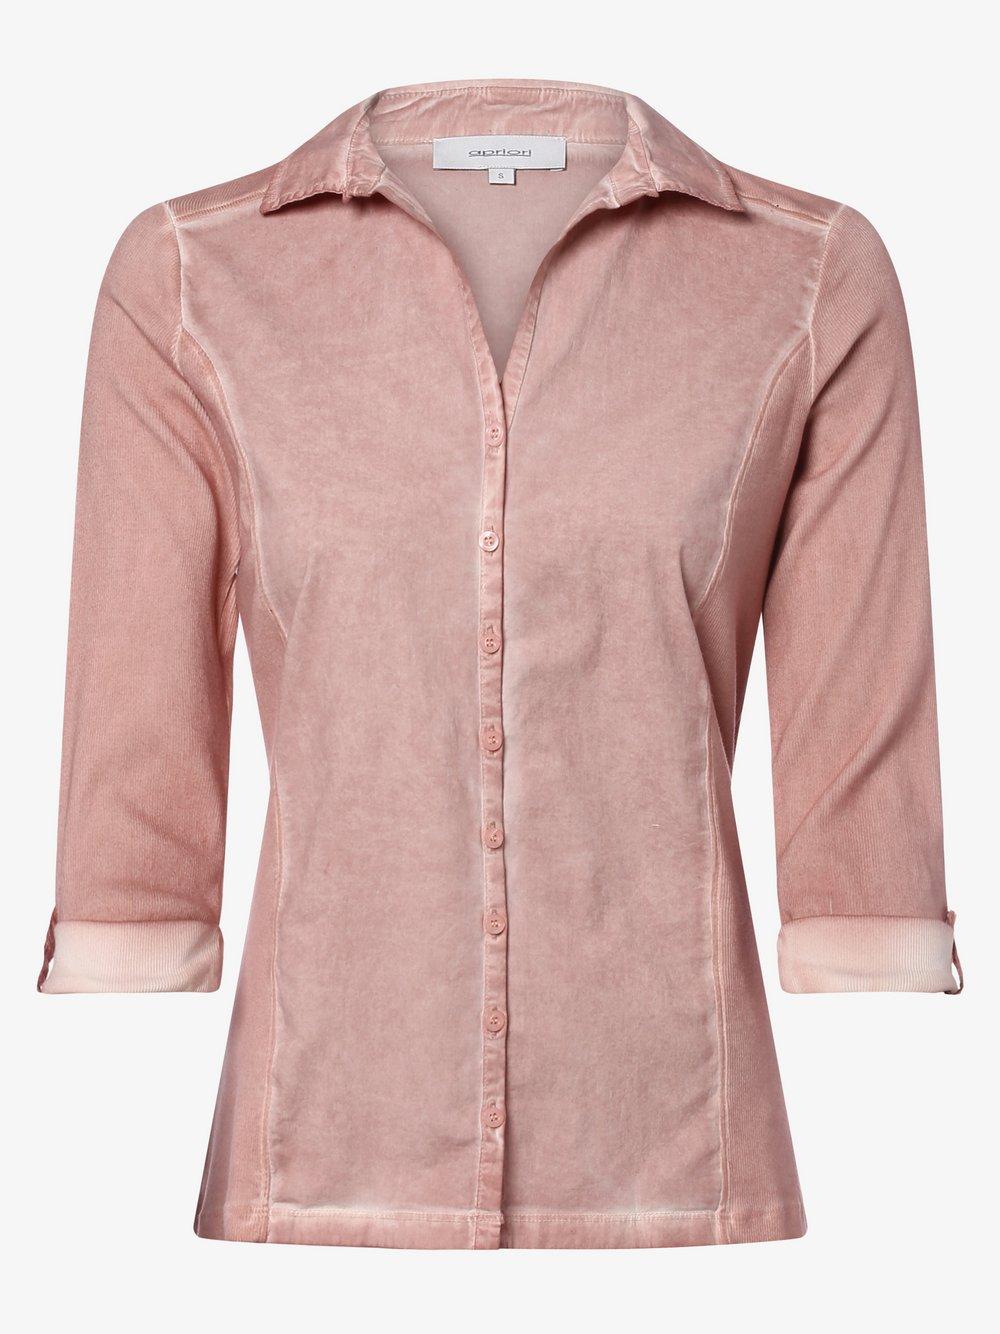 Apriori - Bluzka damska, różowy